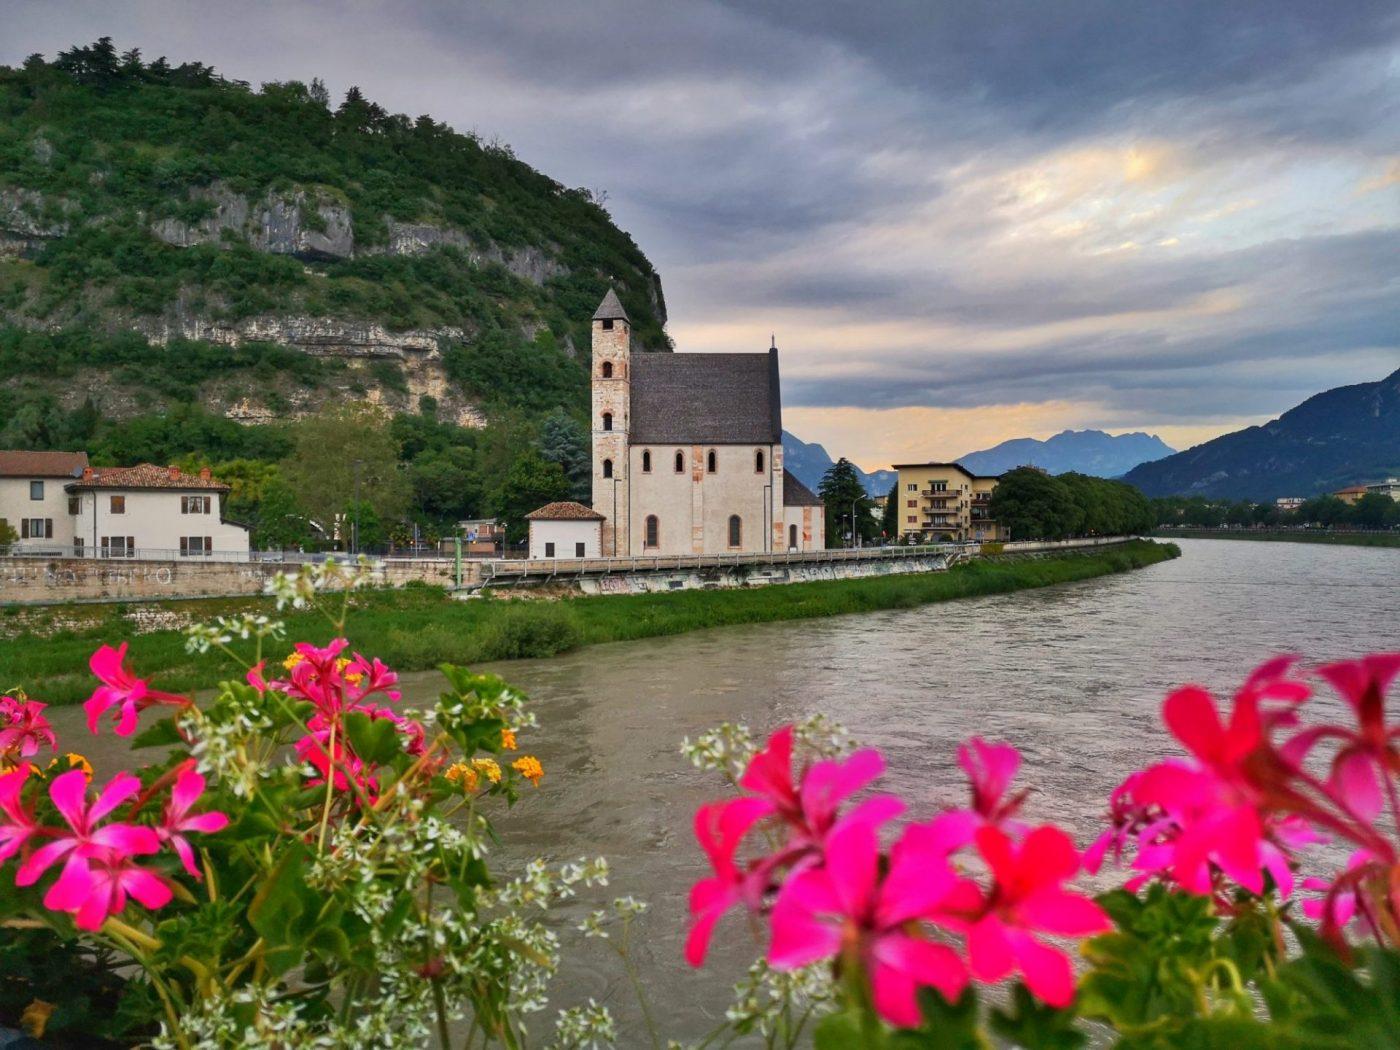 Trento: The Loveliest Italian City You've Never Heard Of